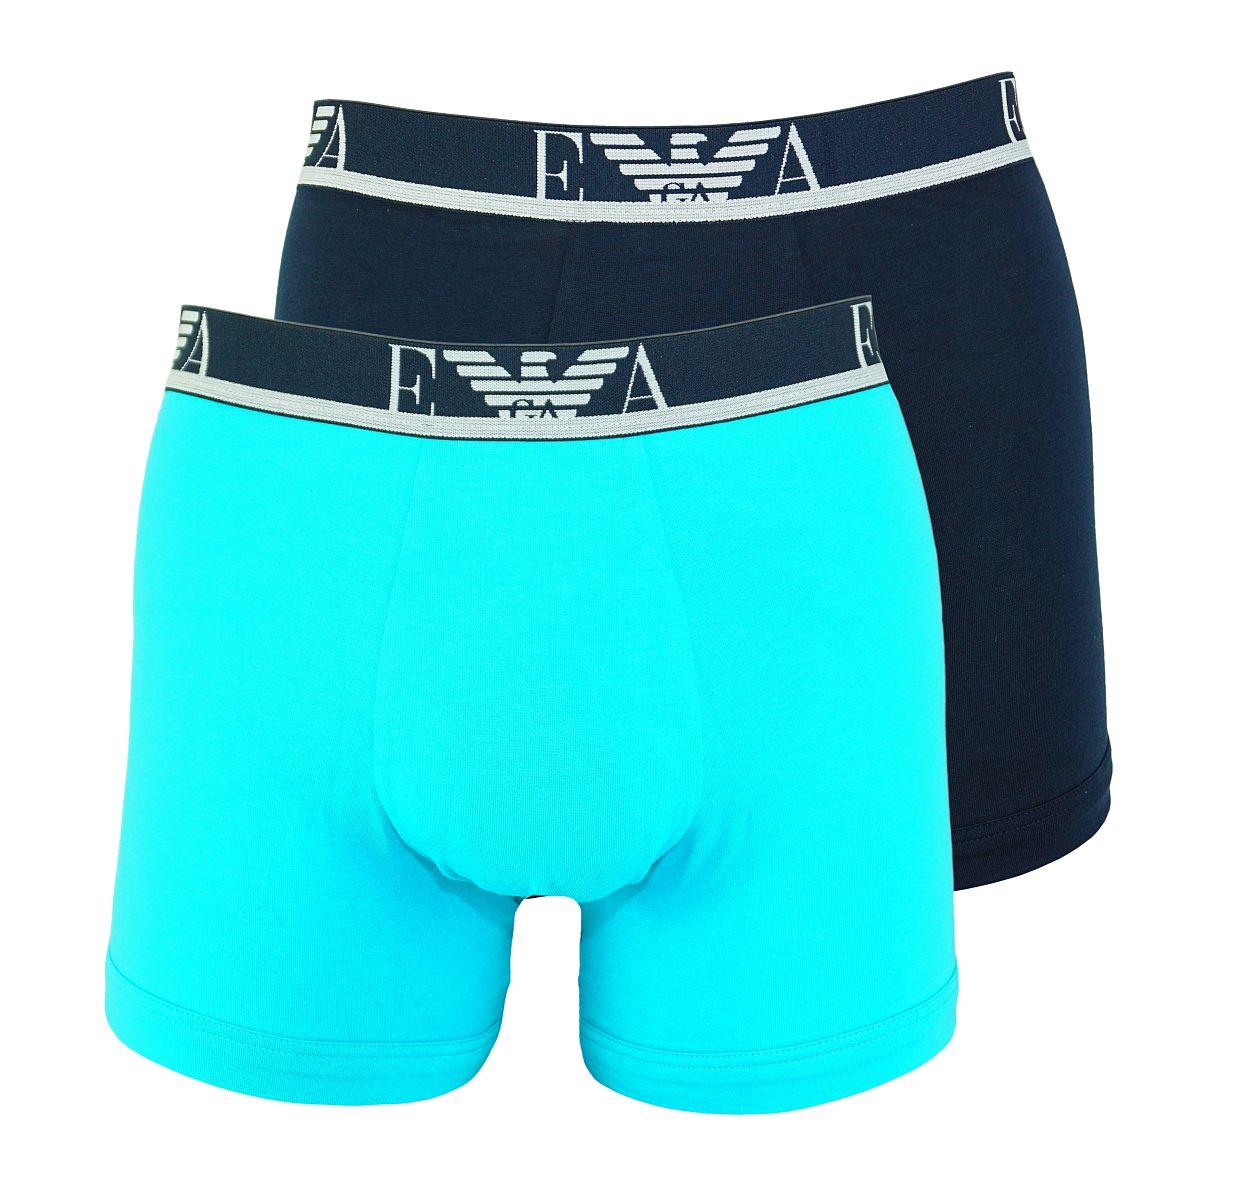 Emporio Armani 2er Pack Shorts Boxer Unterhose 111268 8P715 12683 TURCHESE/MARINE W18-EAB1